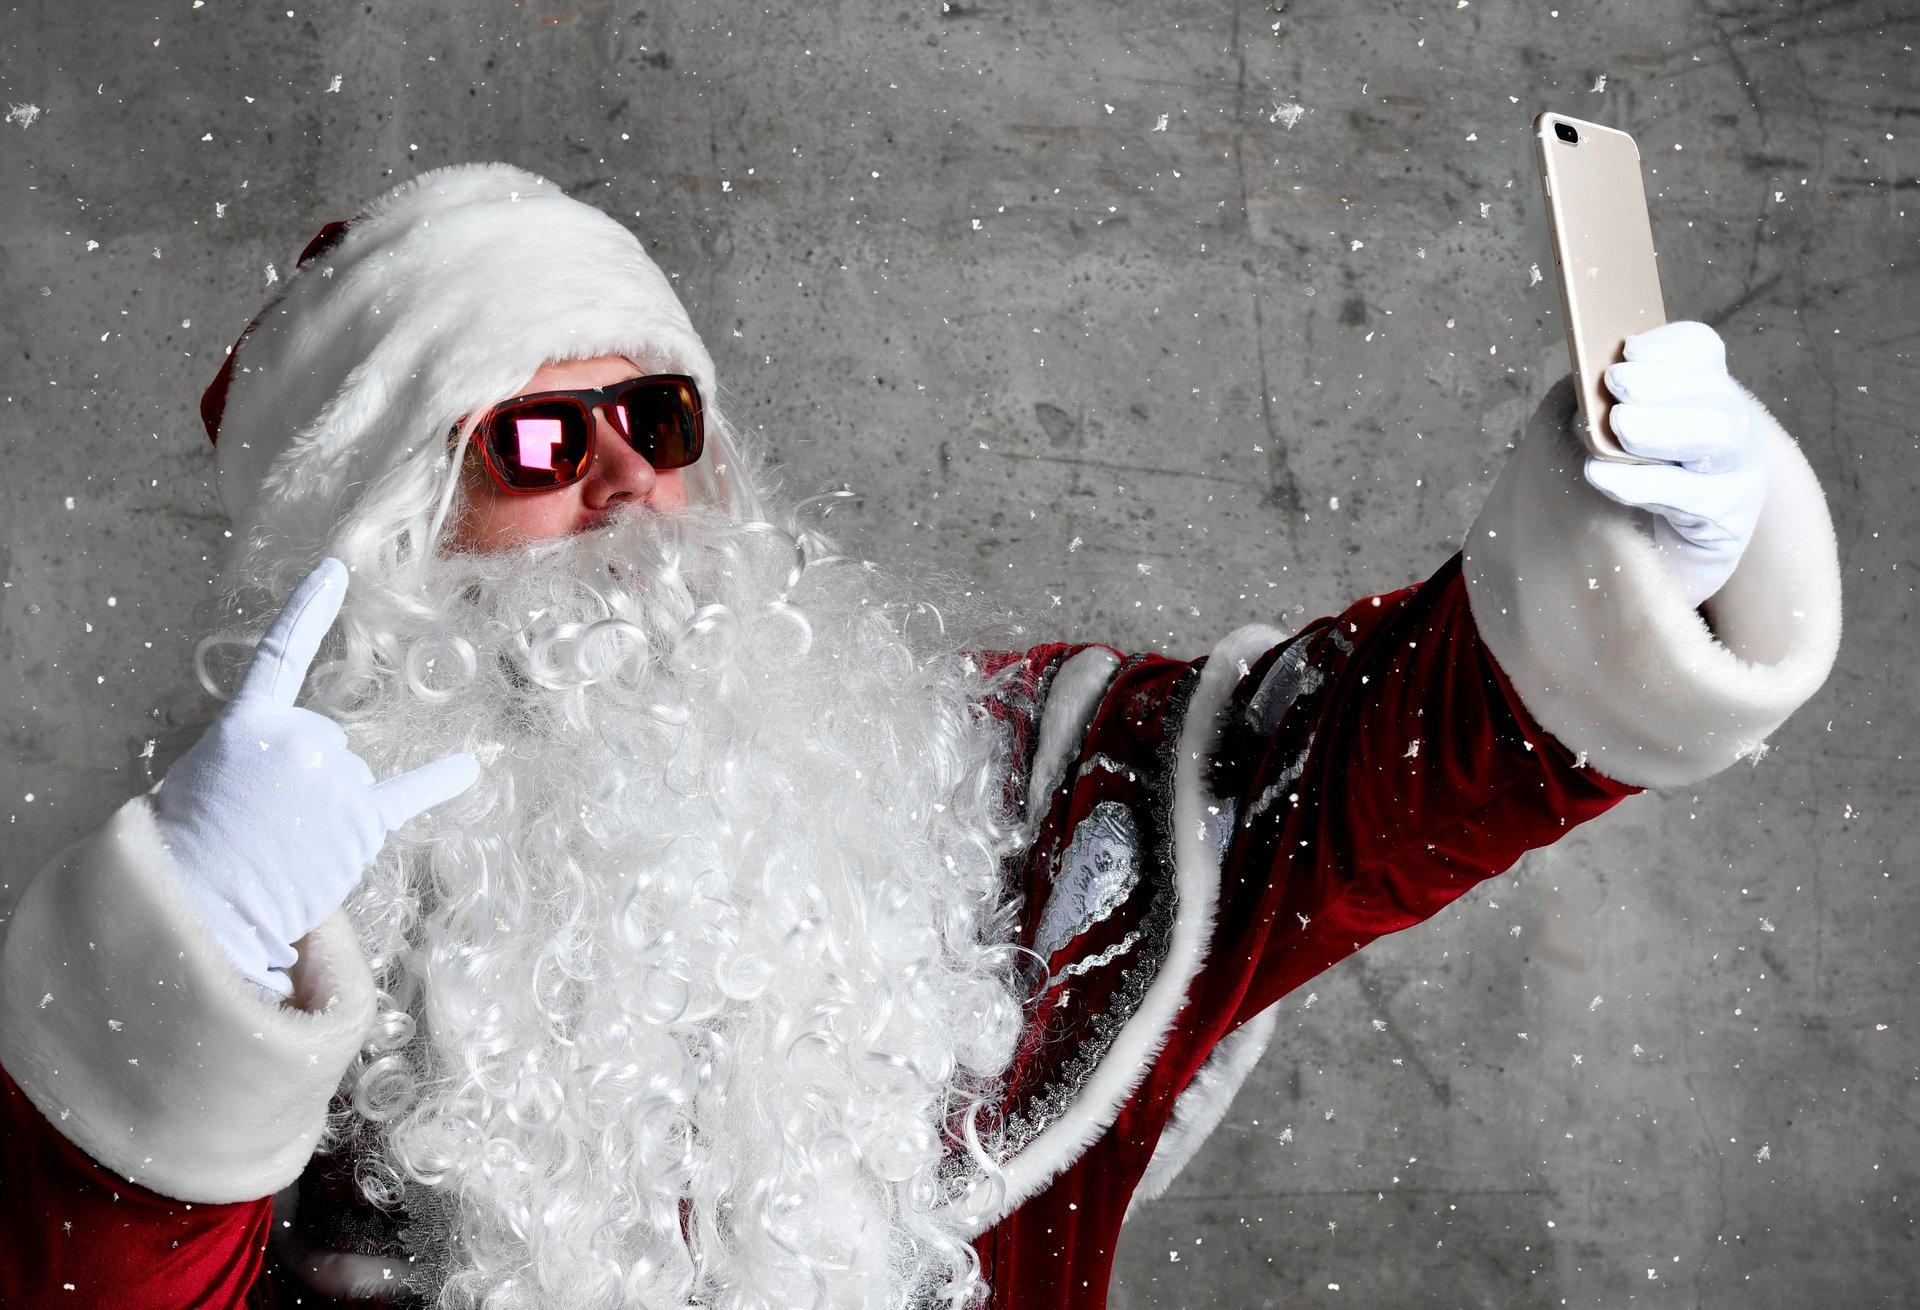 Santa taking a selfie